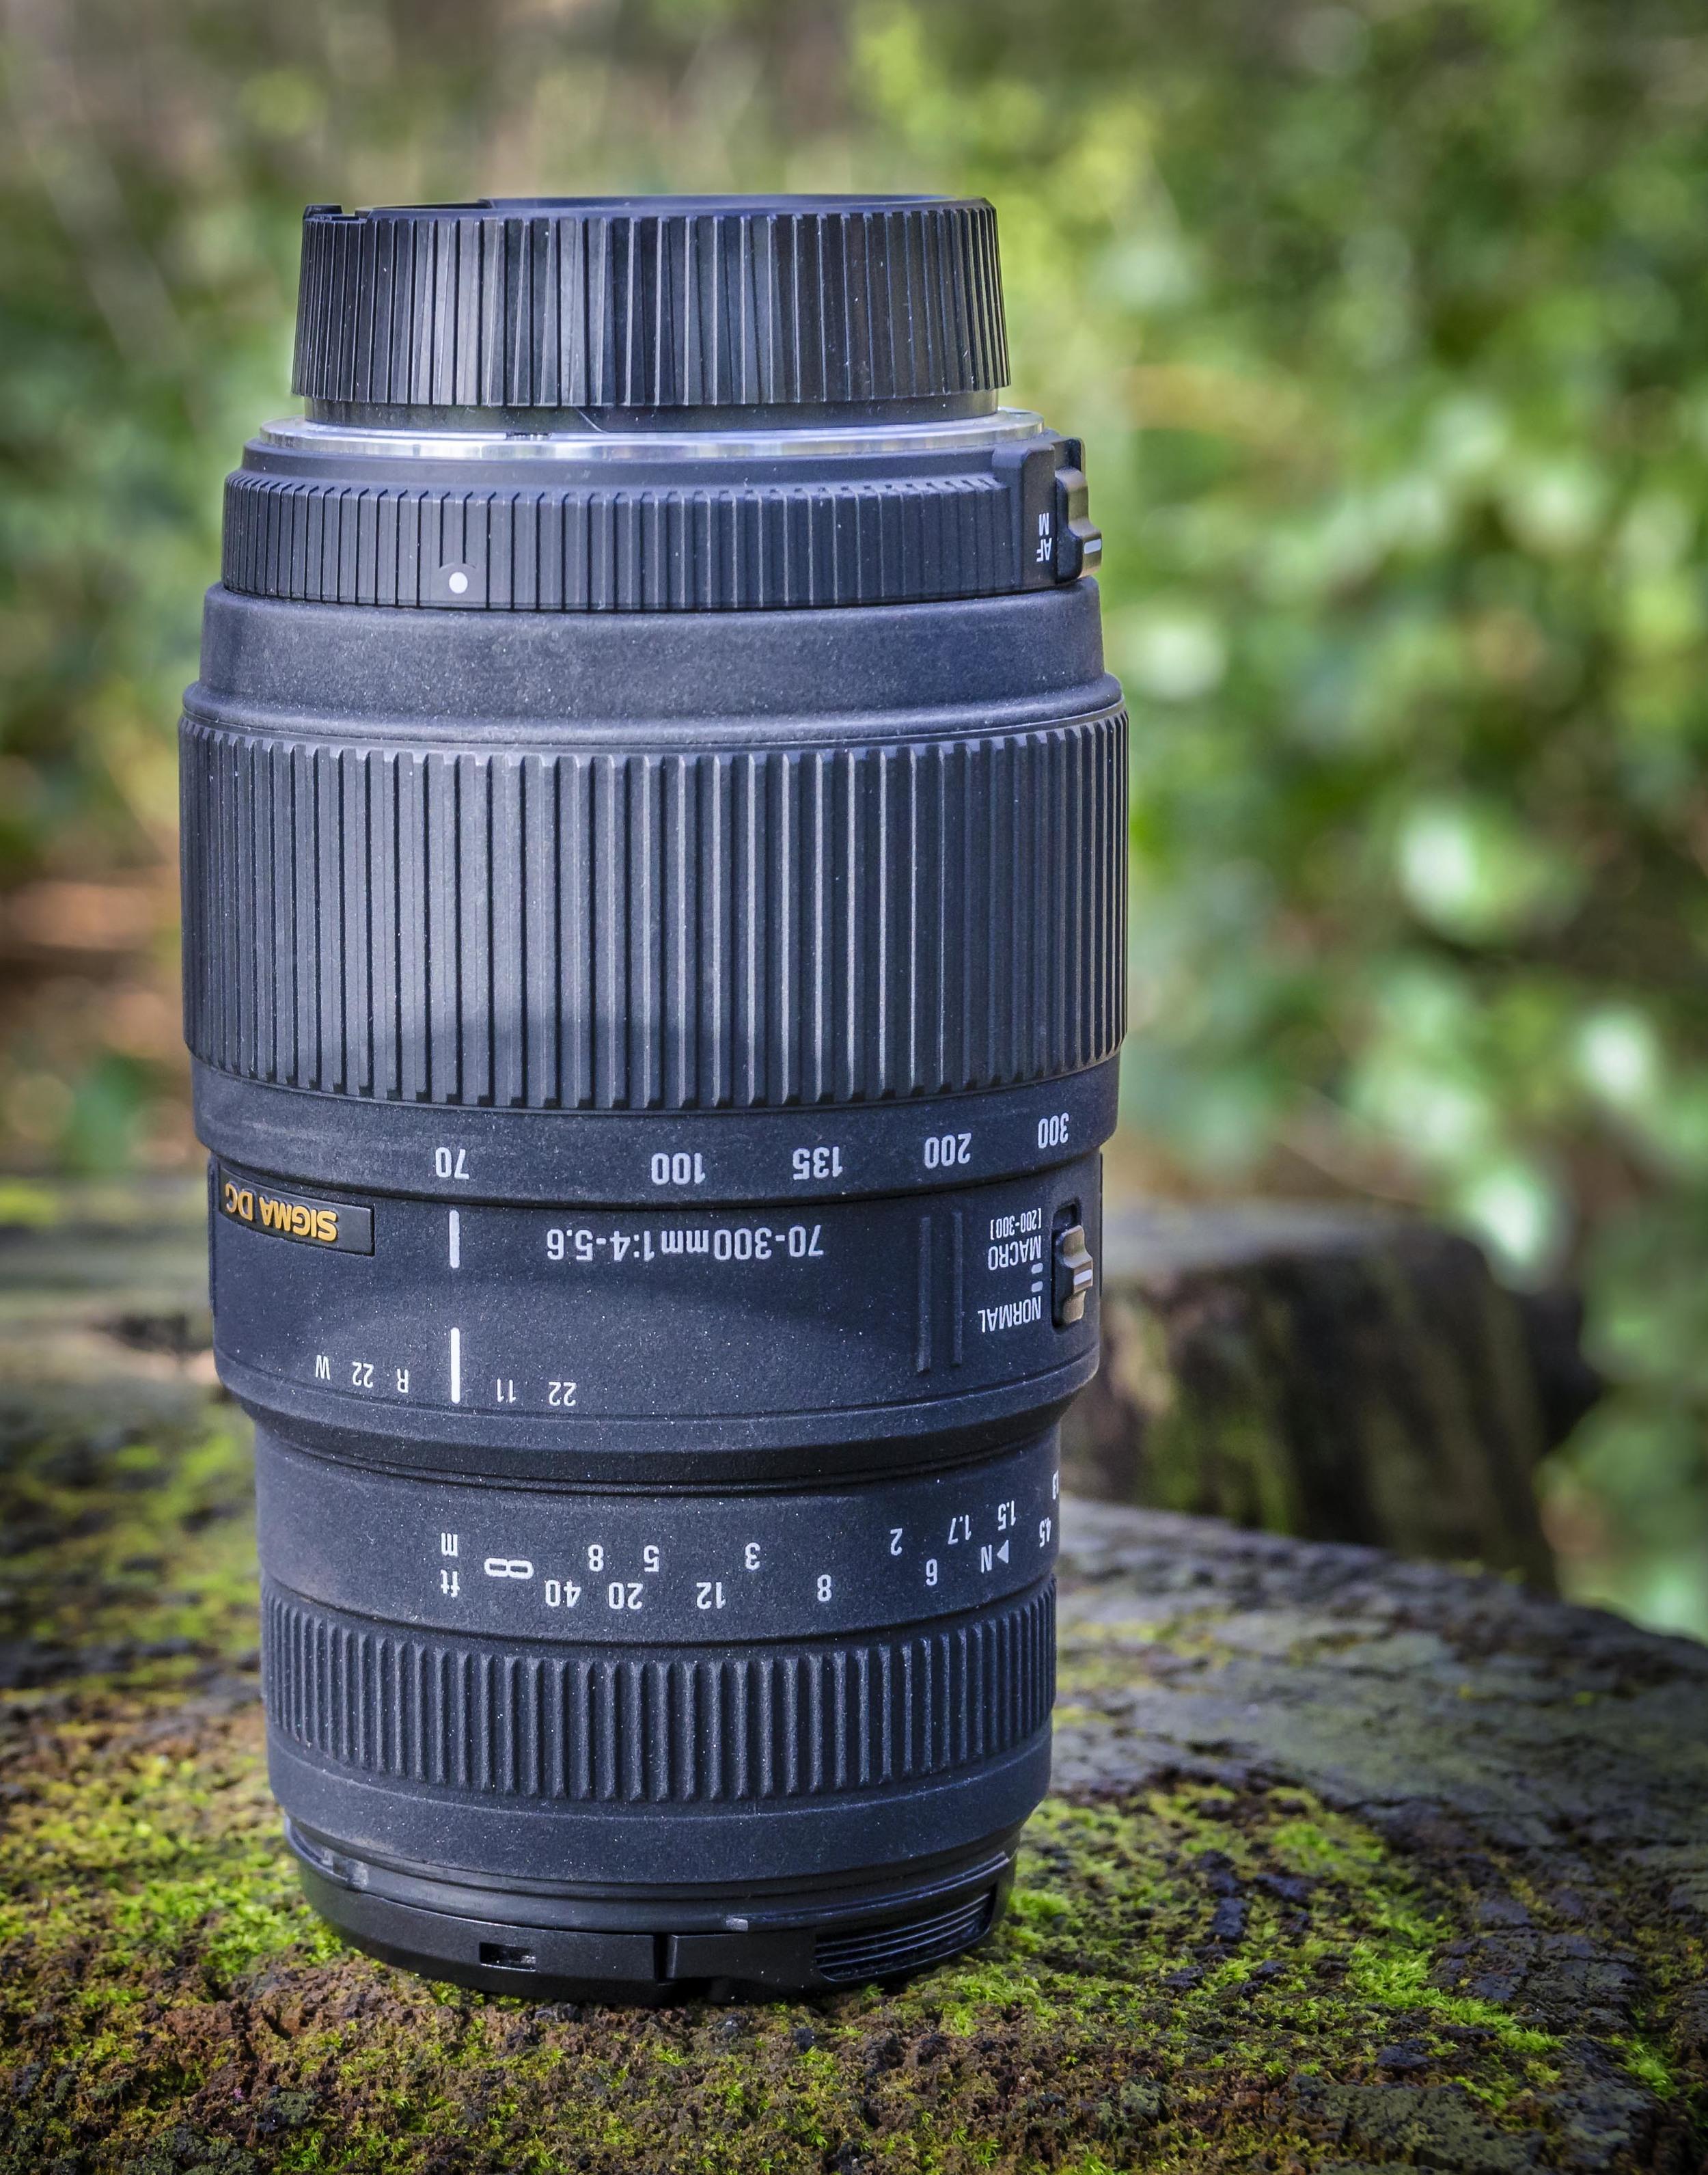 The Sigma 70- 300 mm Macro